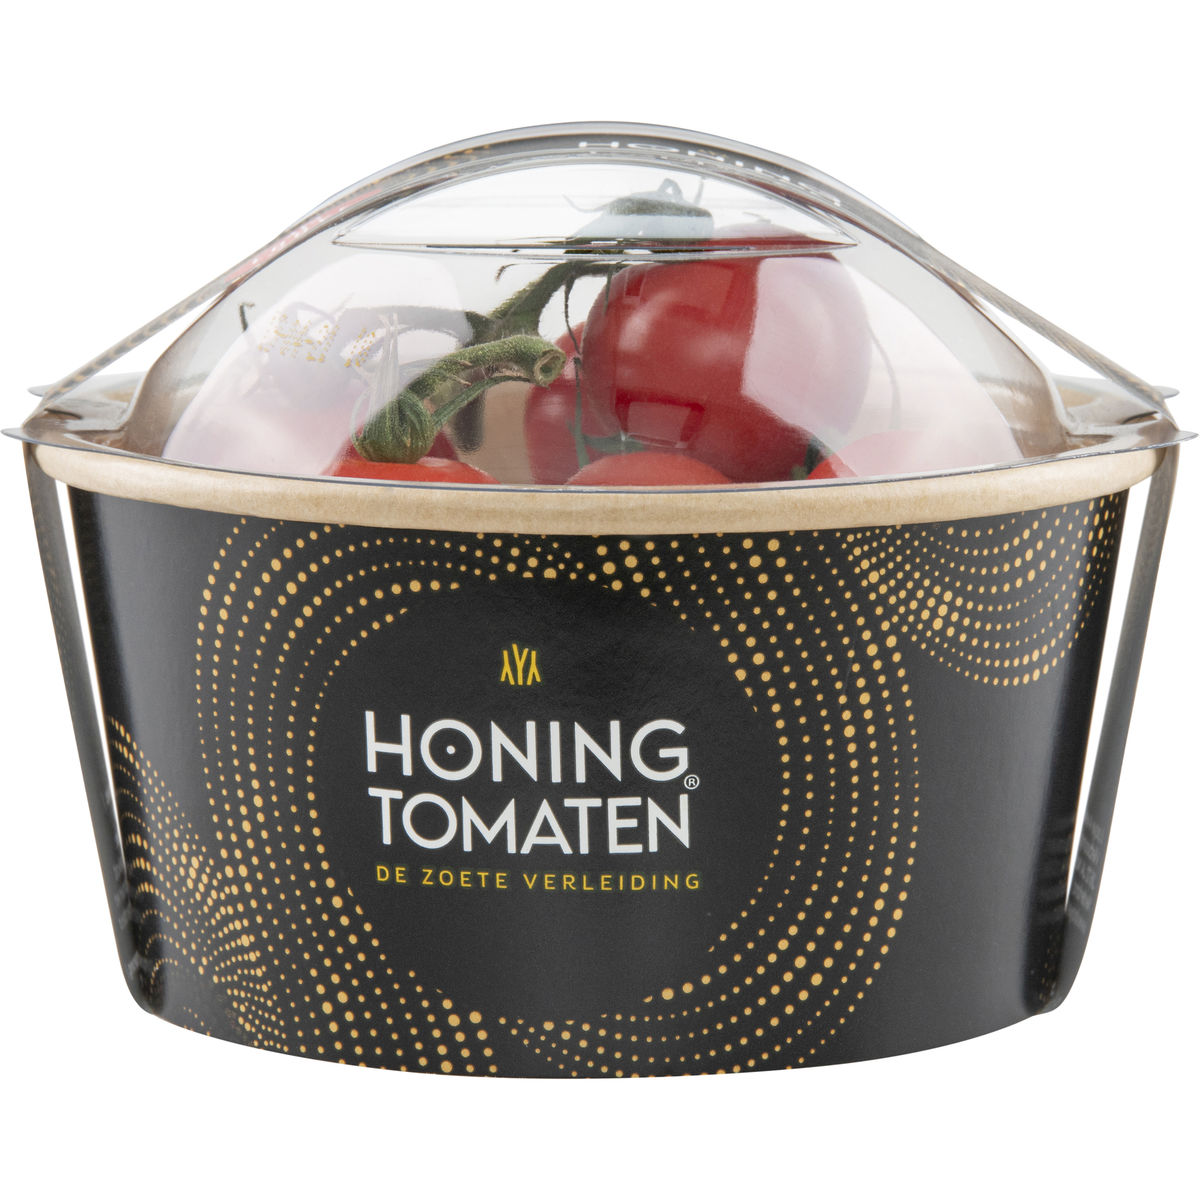 Honingtomaten 180g